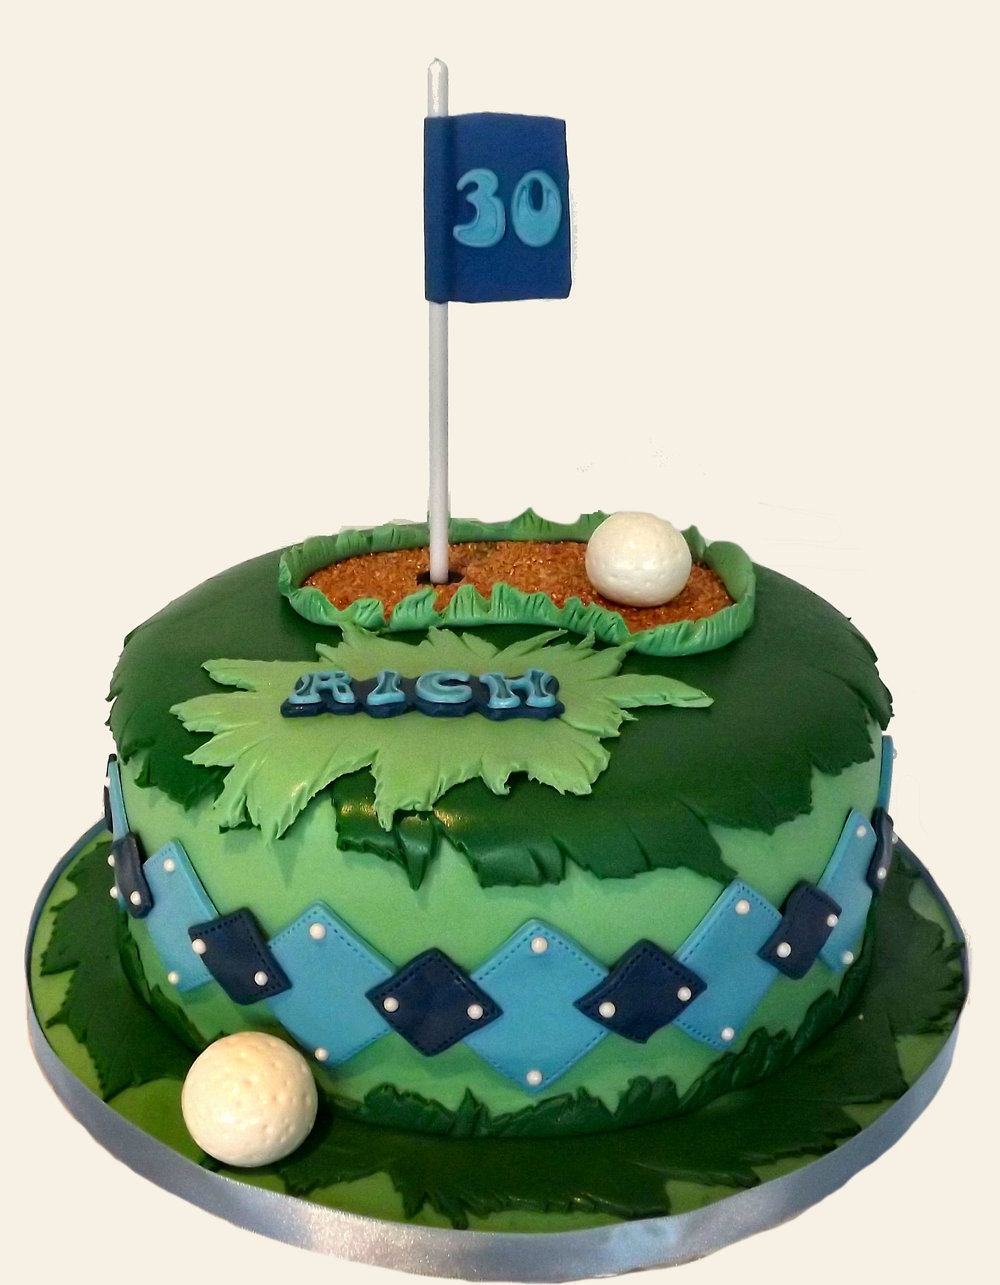 golf cake 1.jpg